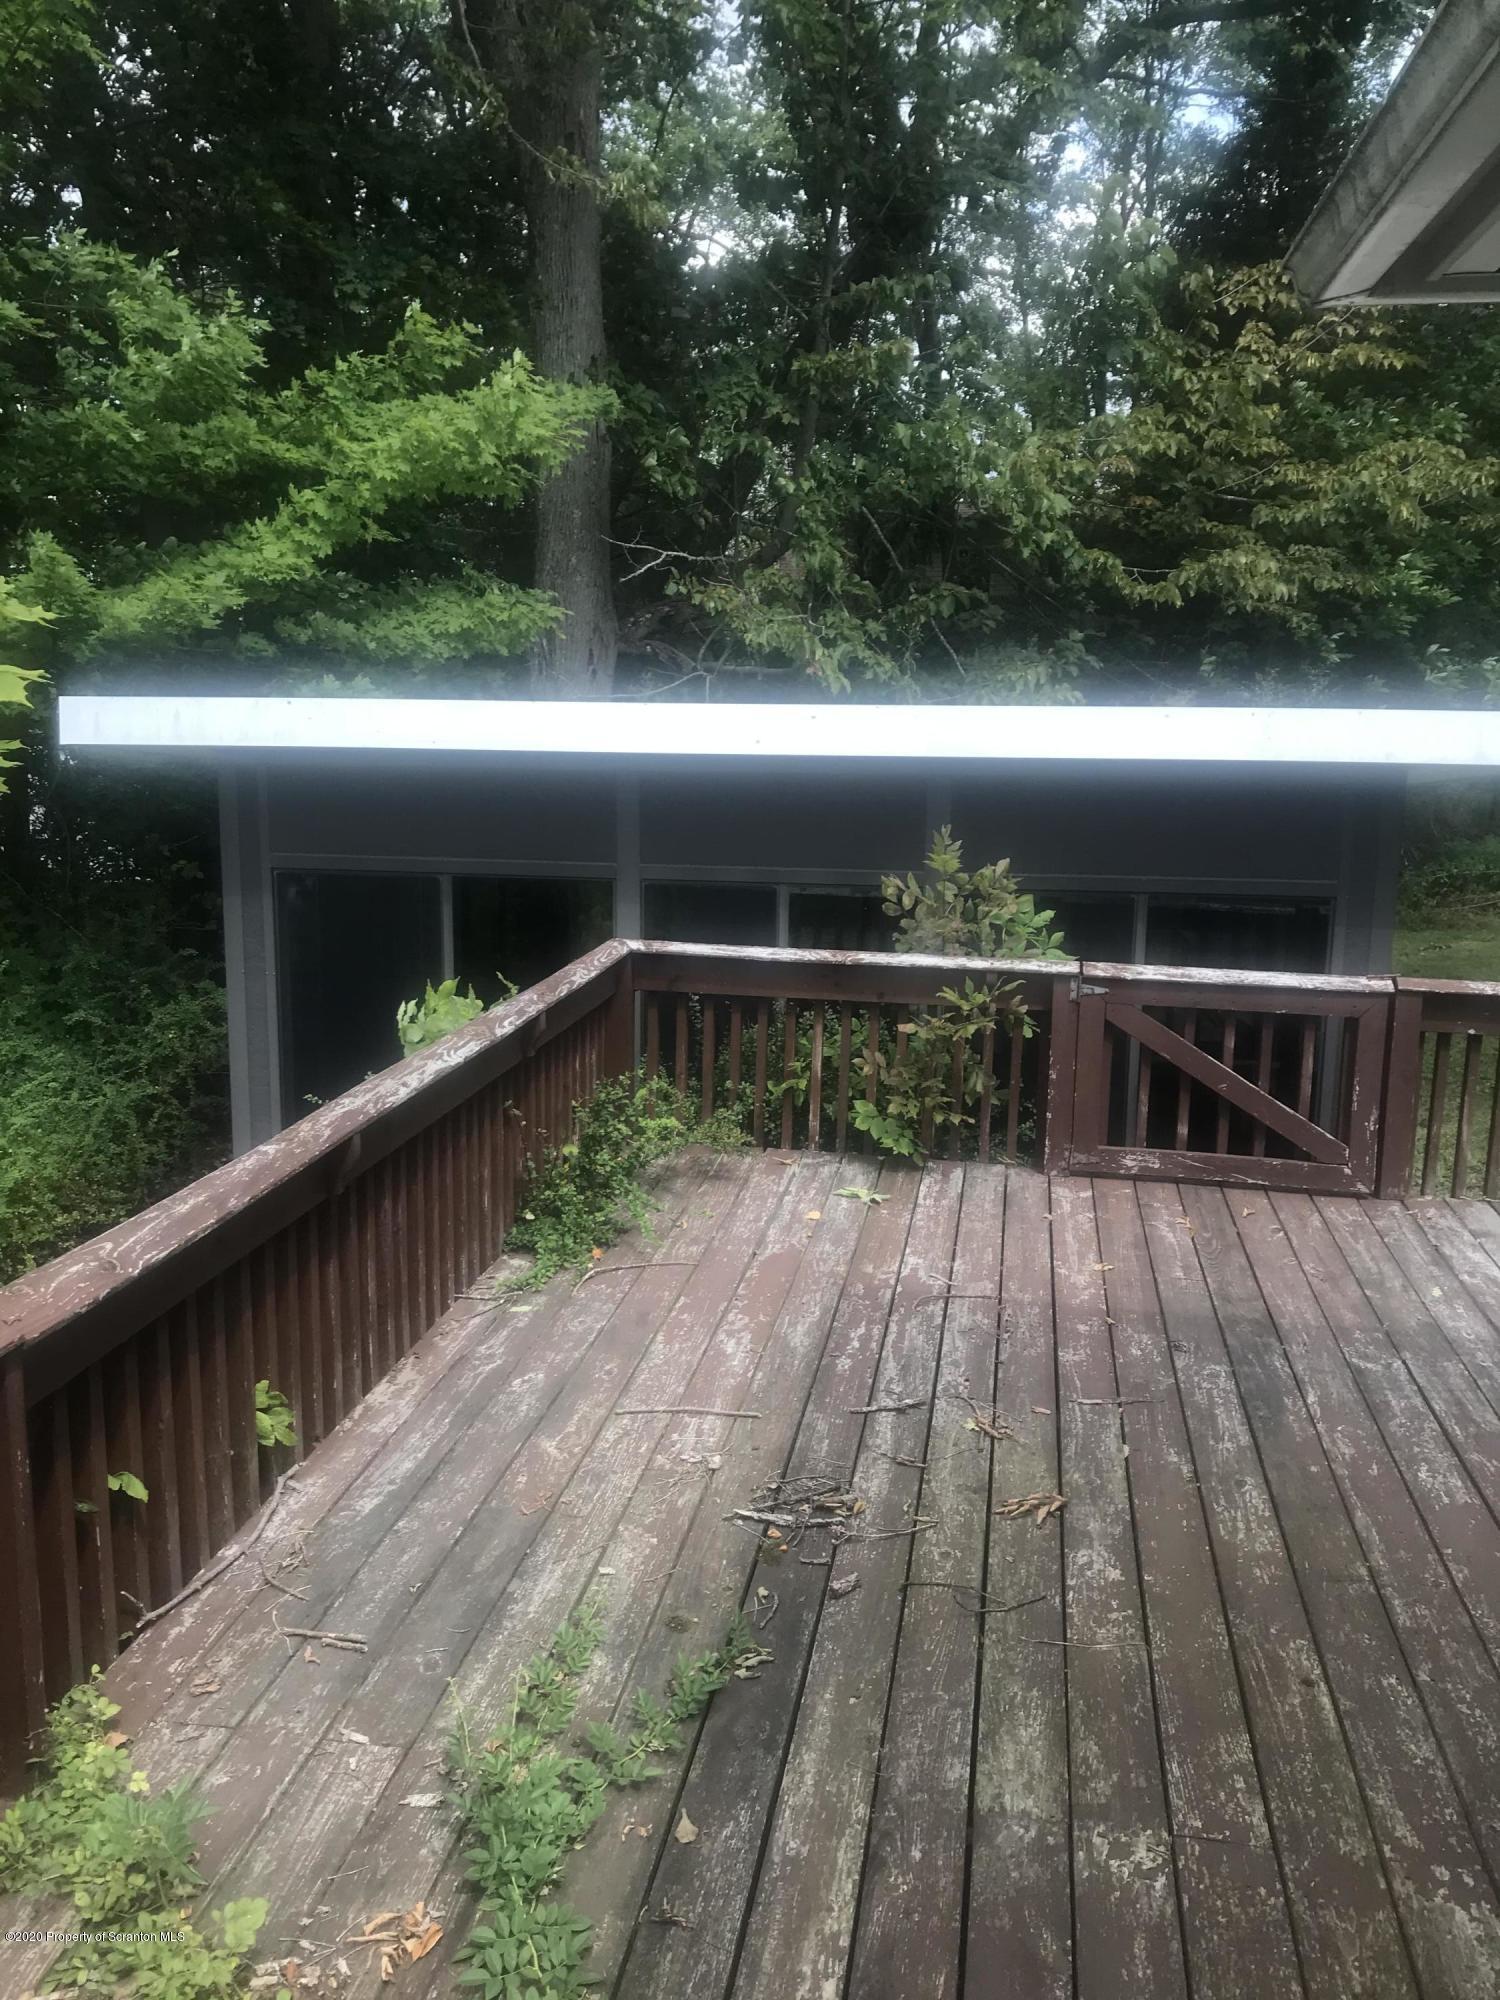 16 Hepplewhite, Scott Twp, Pennsylvania 18433, 2 Bedrooms Bedrooms, 5 Rooms Rooms,1 BathroomBathrooms,Single Family,For Sale,Hepplewhite,20-3414